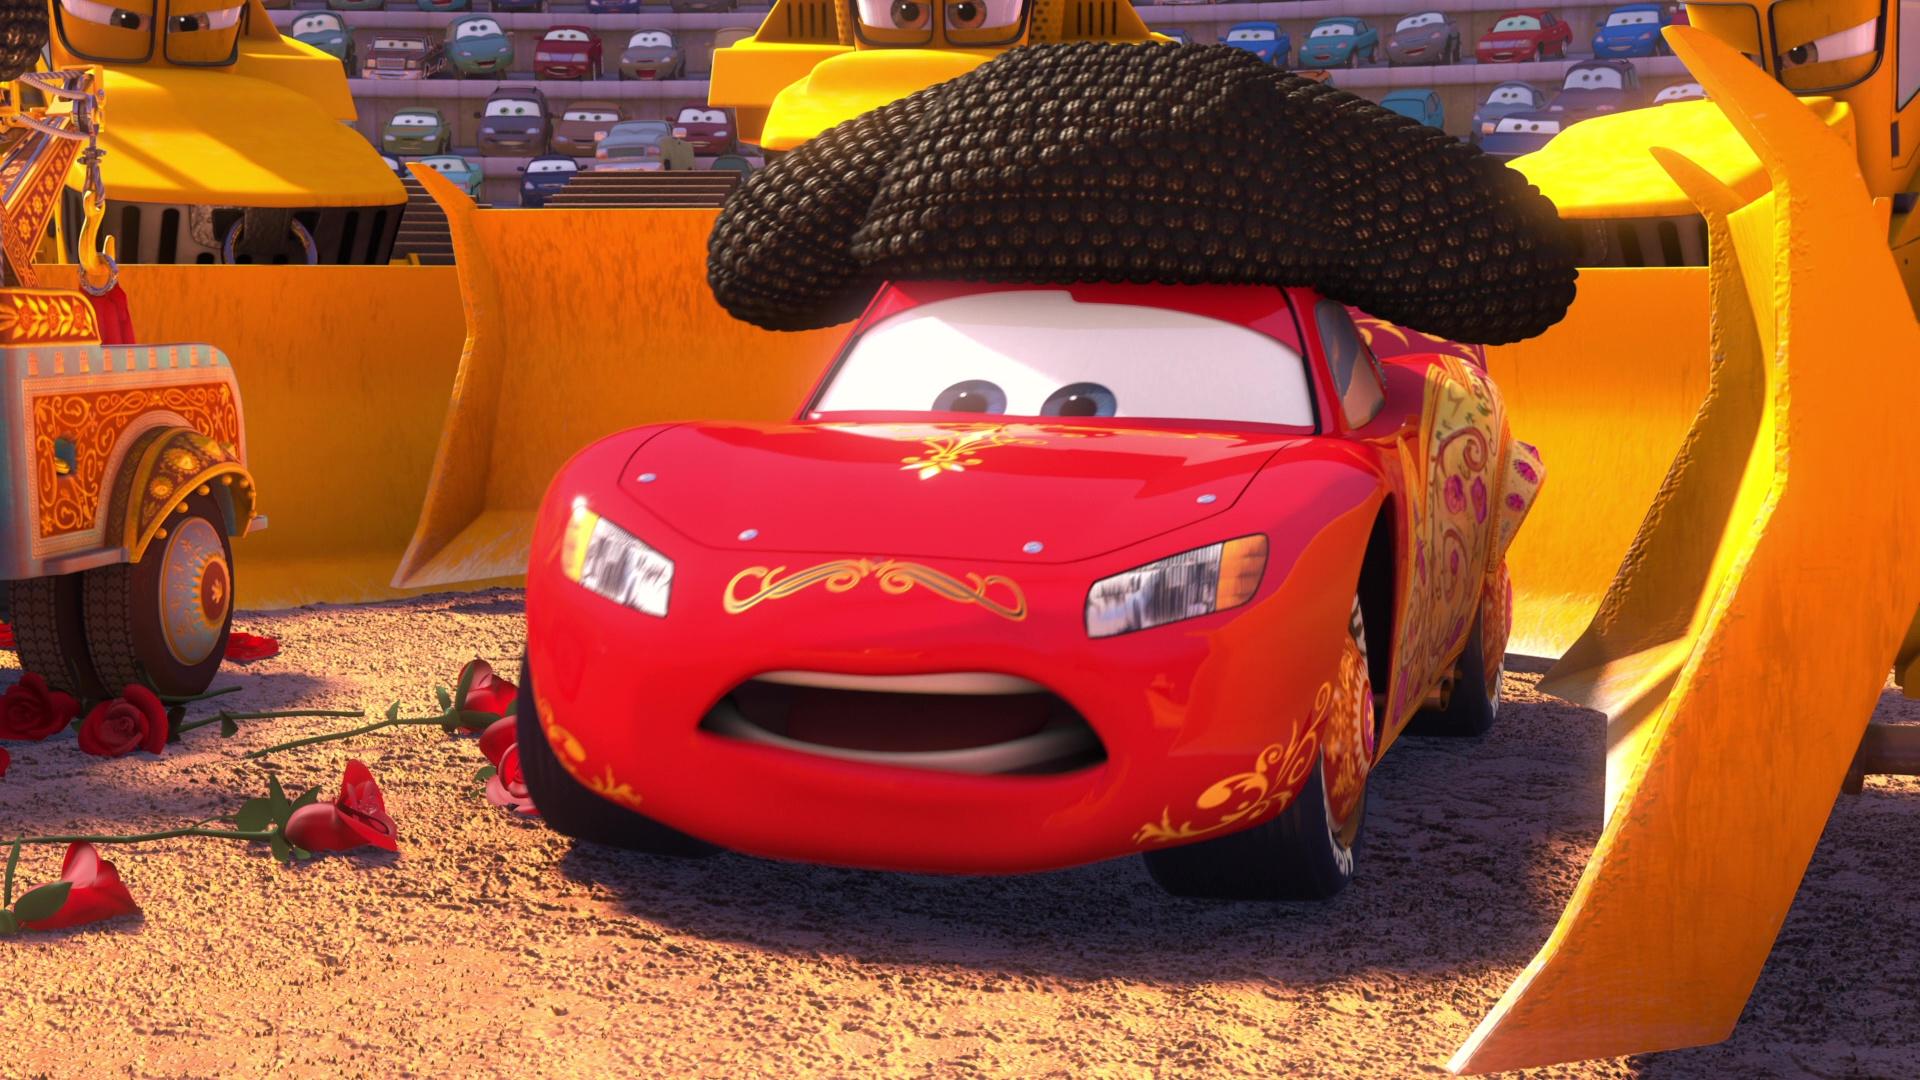 Pixar Disney Flash Mcqueen Personnage Lightning Character concernant Flash Mcqueen Martin